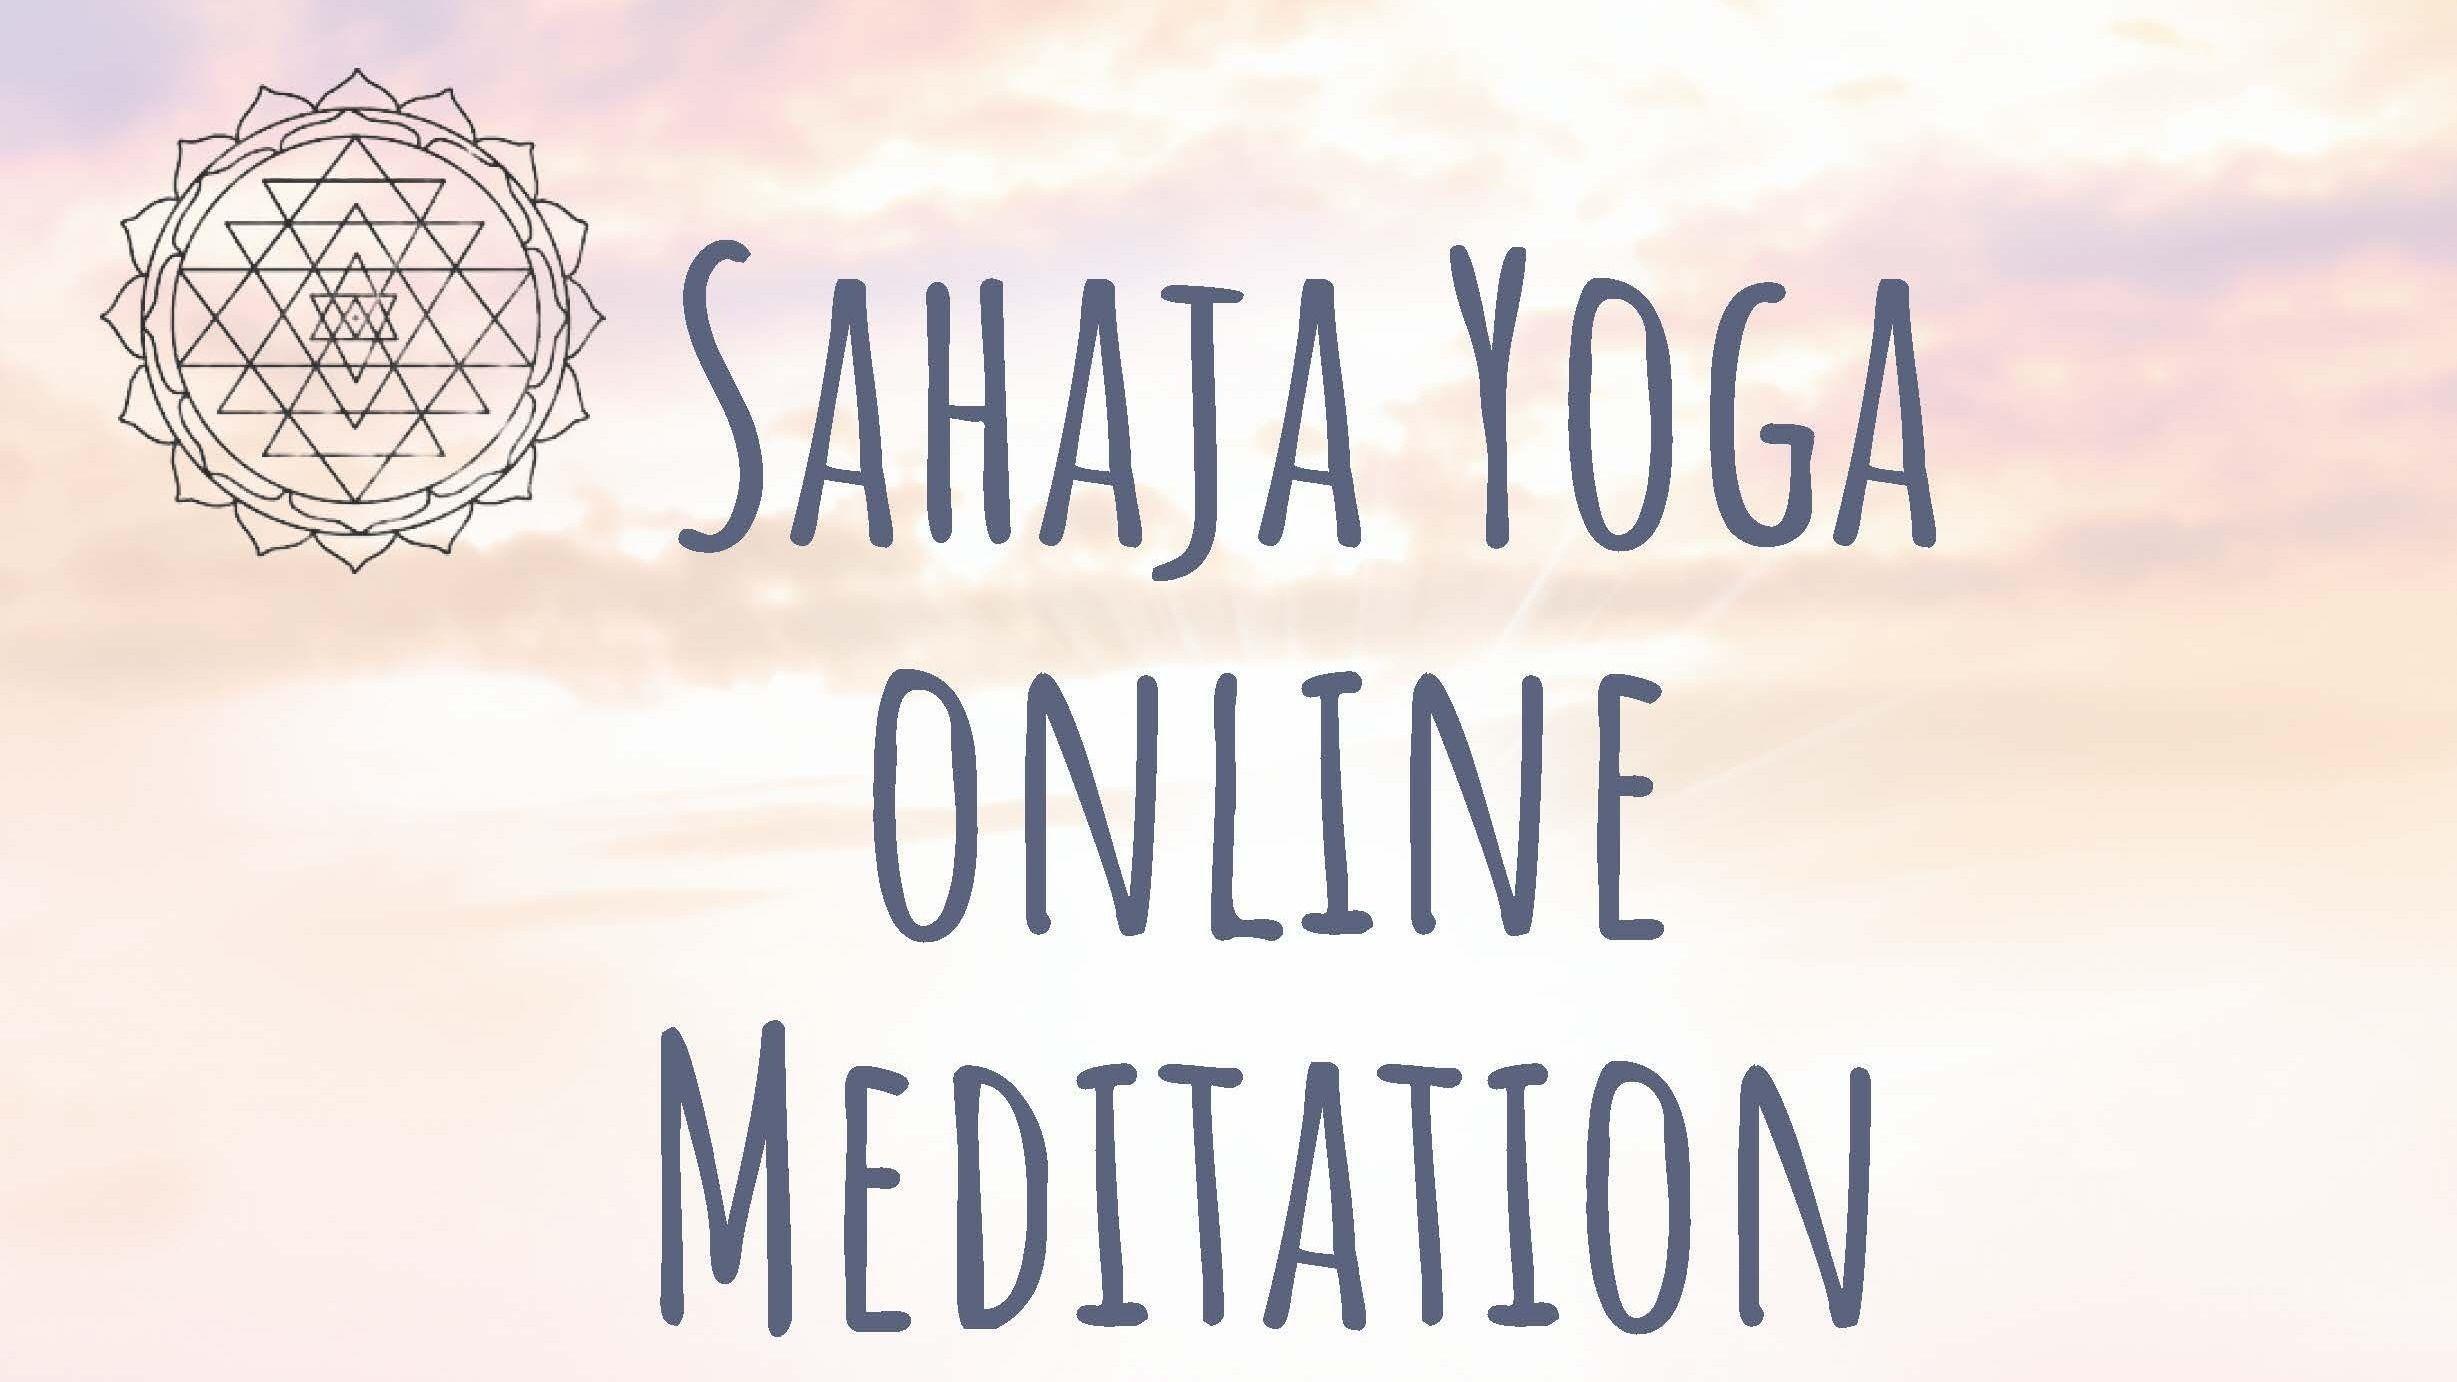 Sahaja Yoga Meditation Online